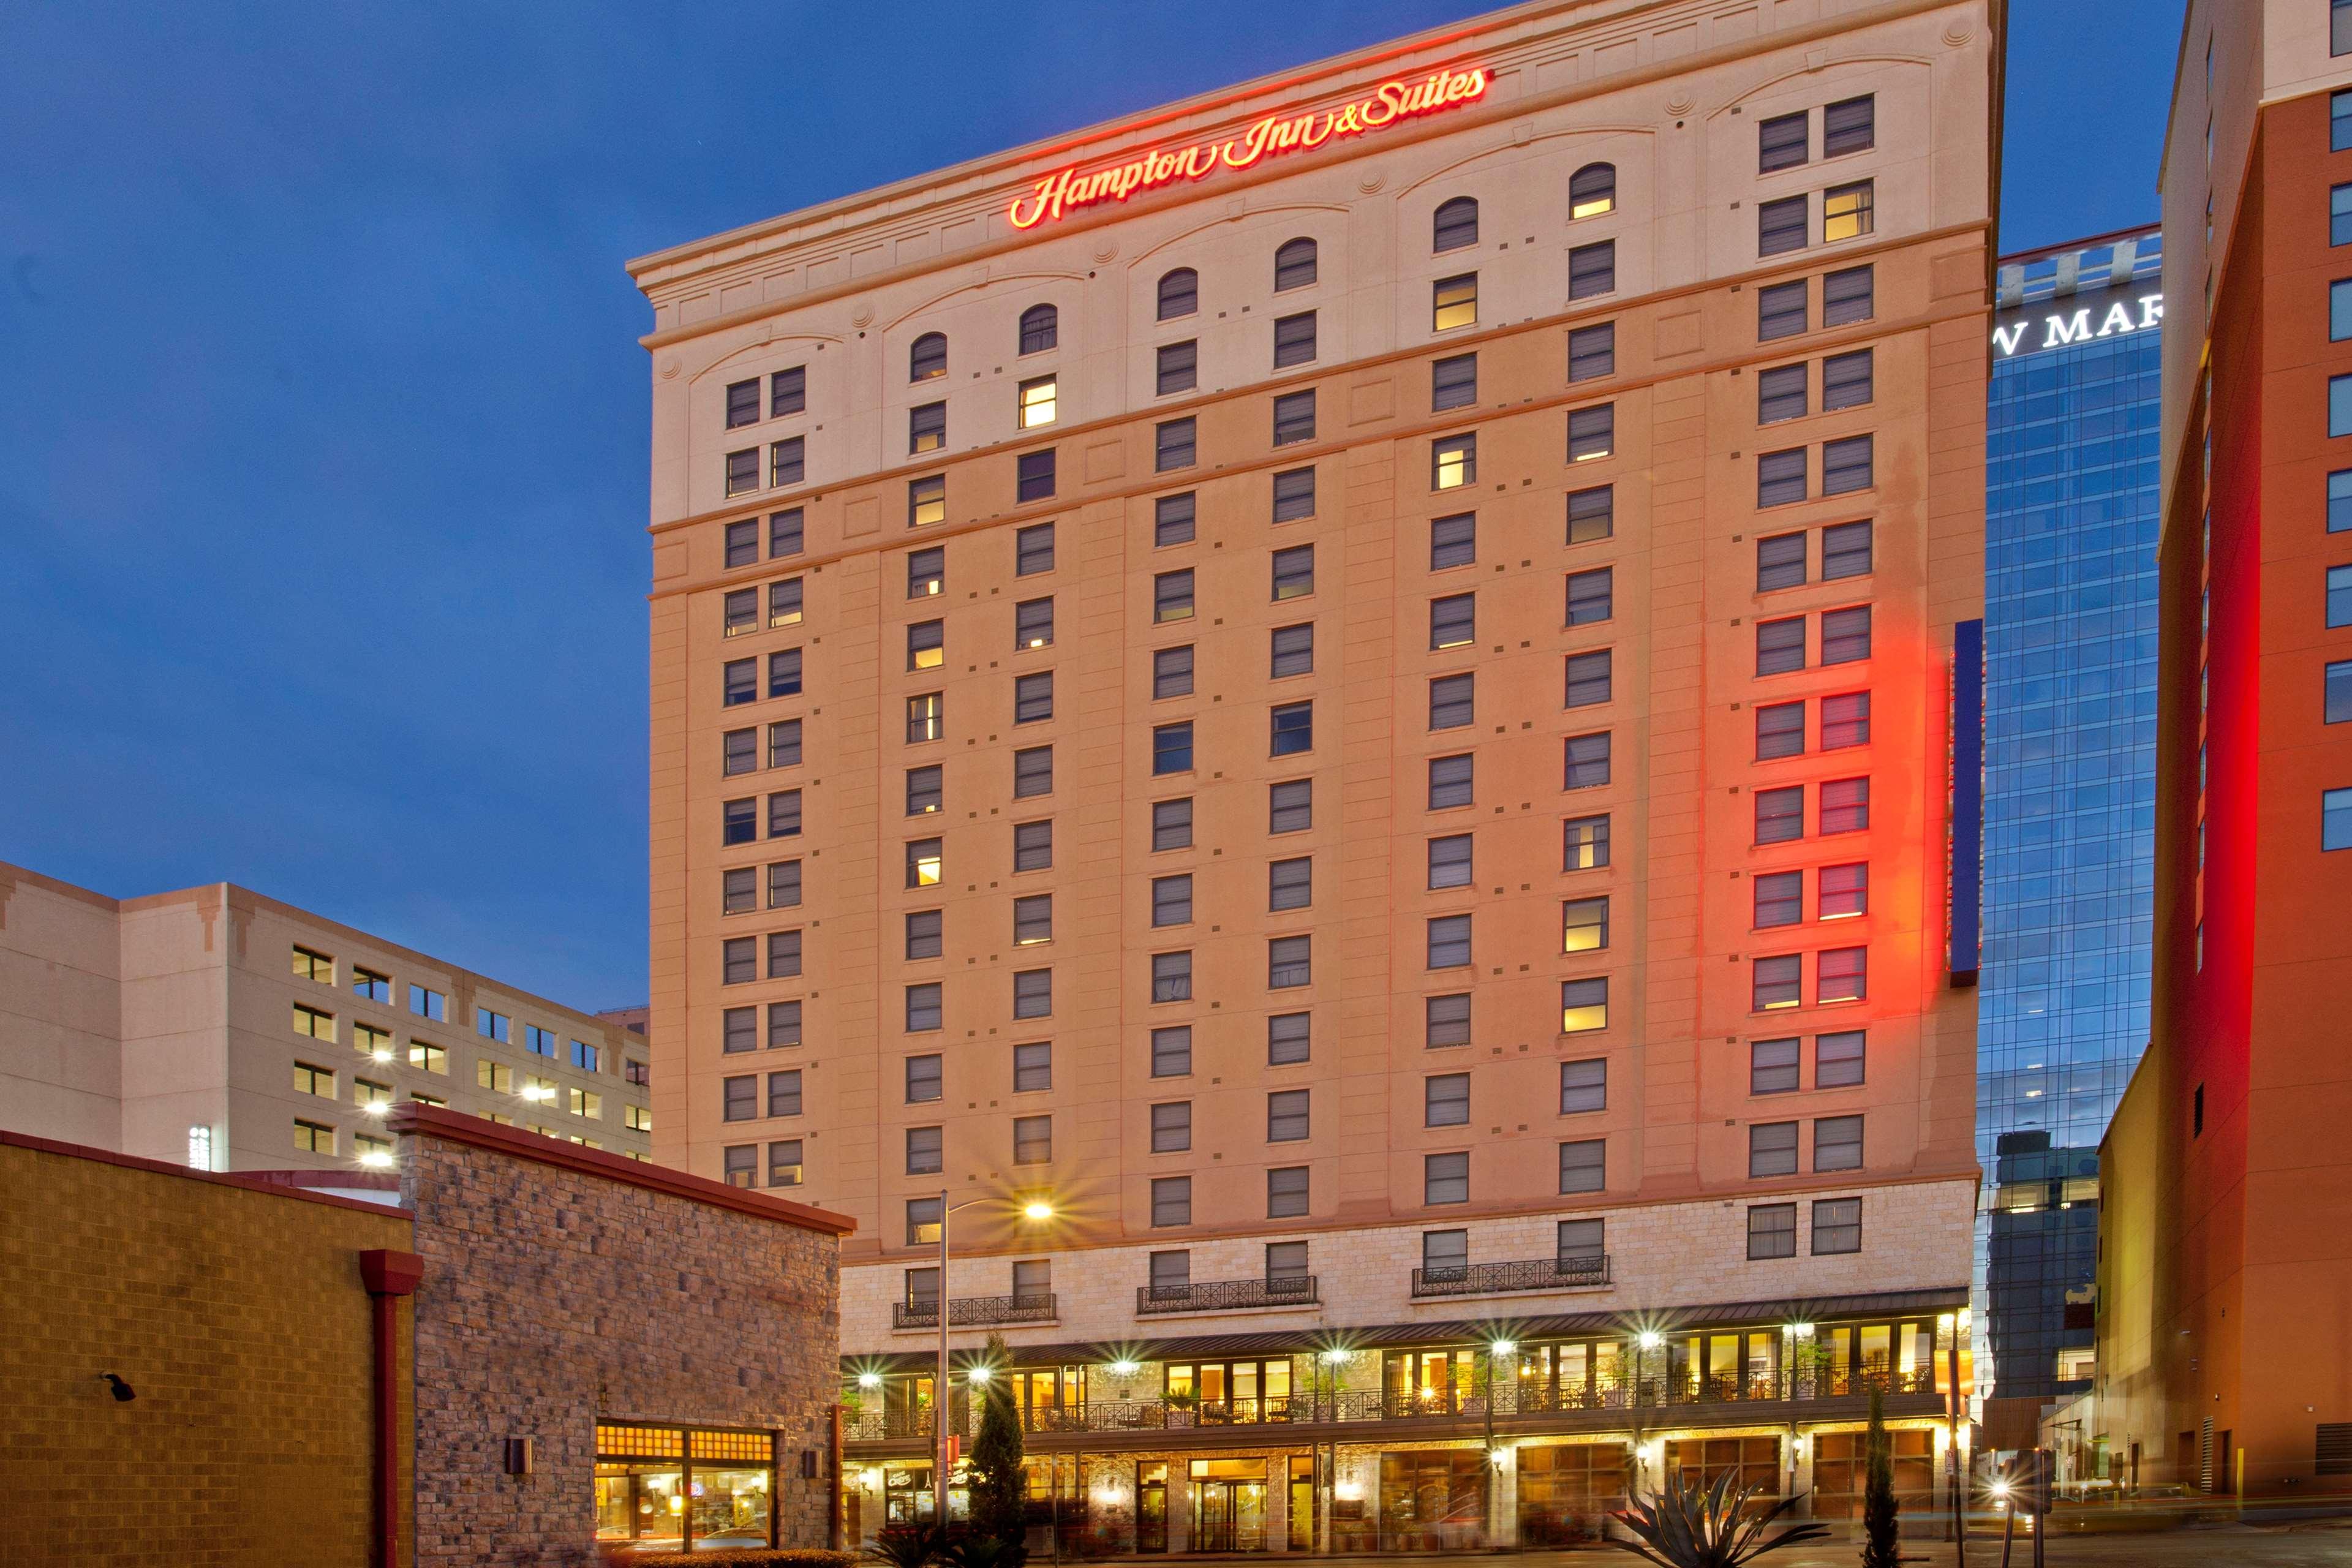 hampton inn suites austin downtown convention center 200. Black Bedroom Furniture Sets. Home Design Ideas